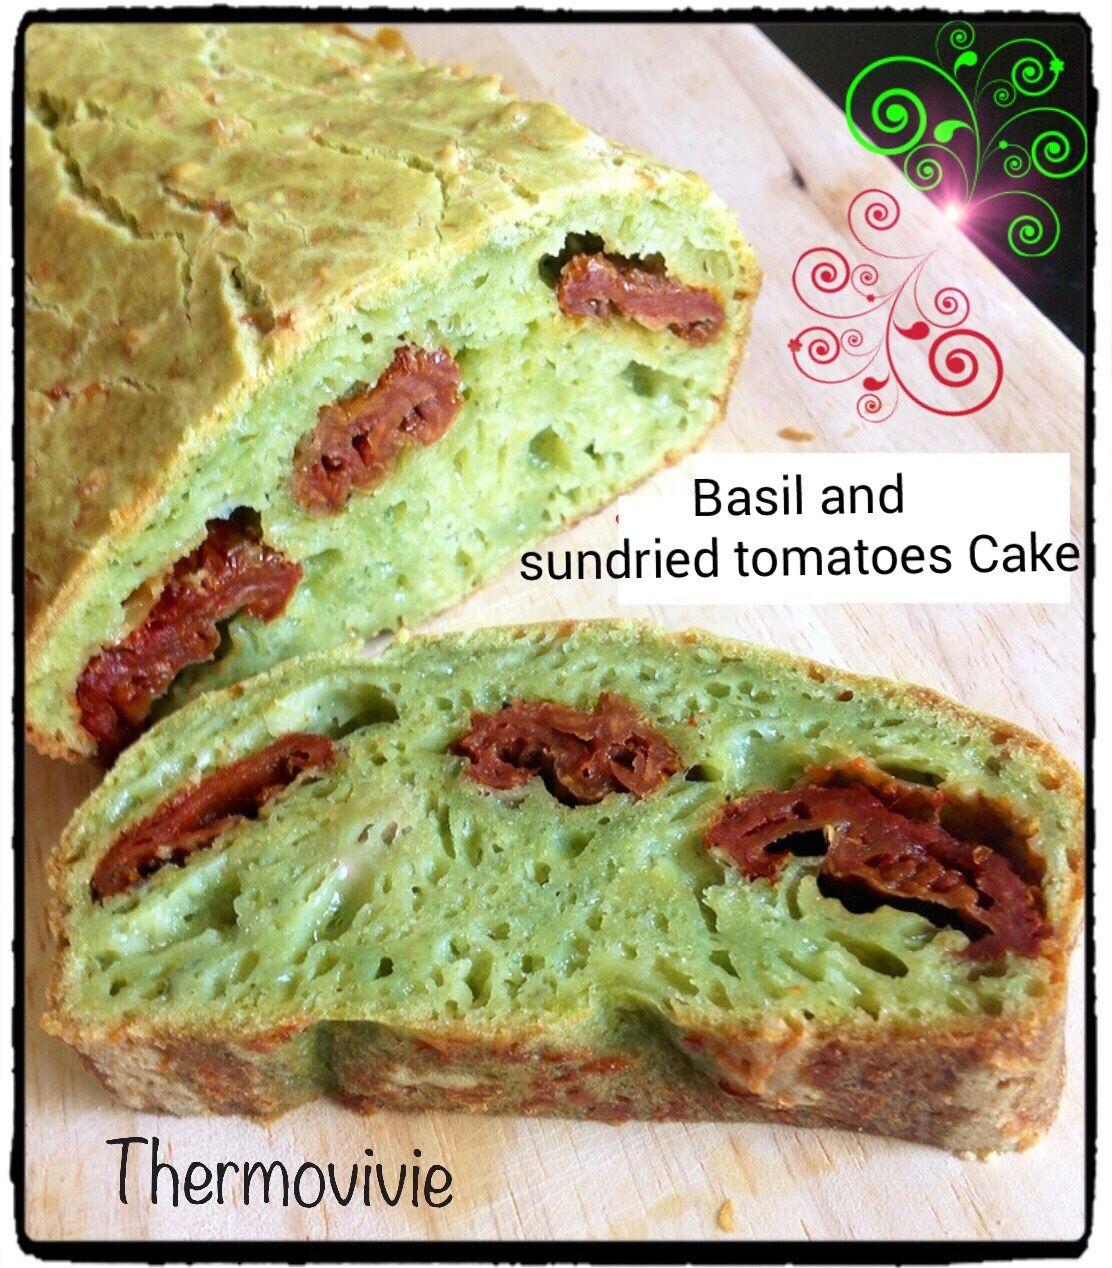 Basil and sundried tomatoes Cake